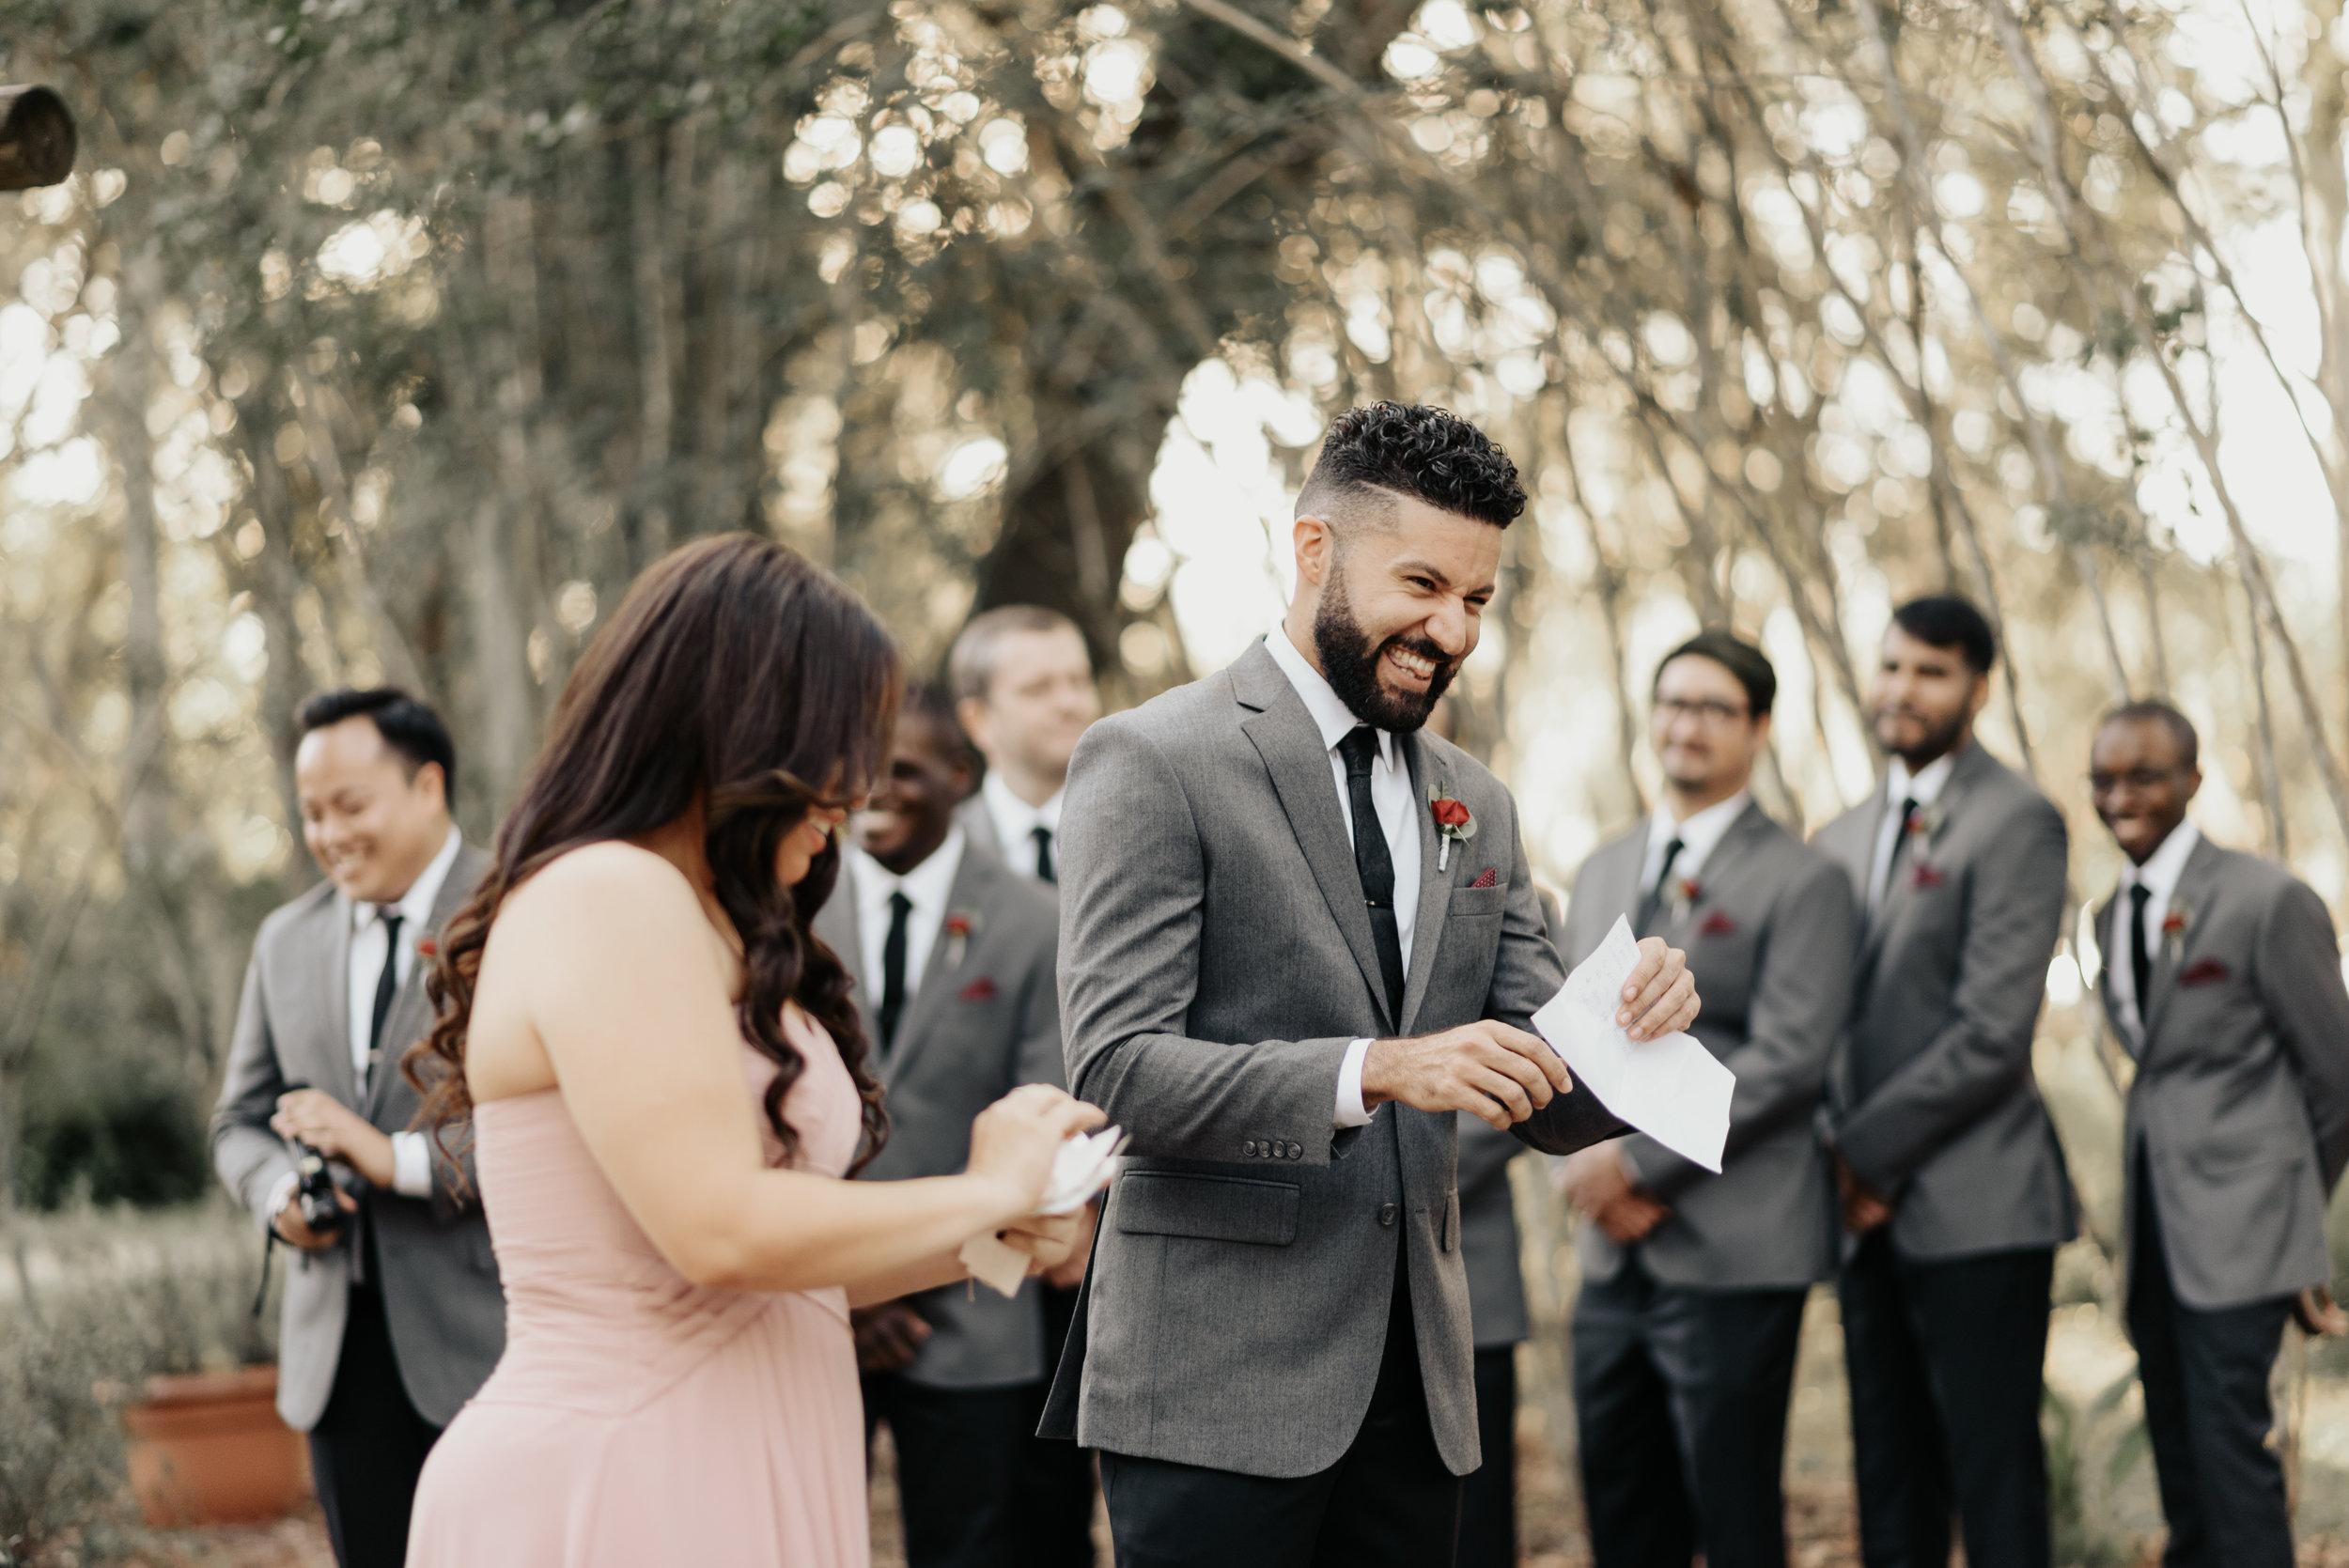 Kirstie-AJ-Wedding-0009.jpg